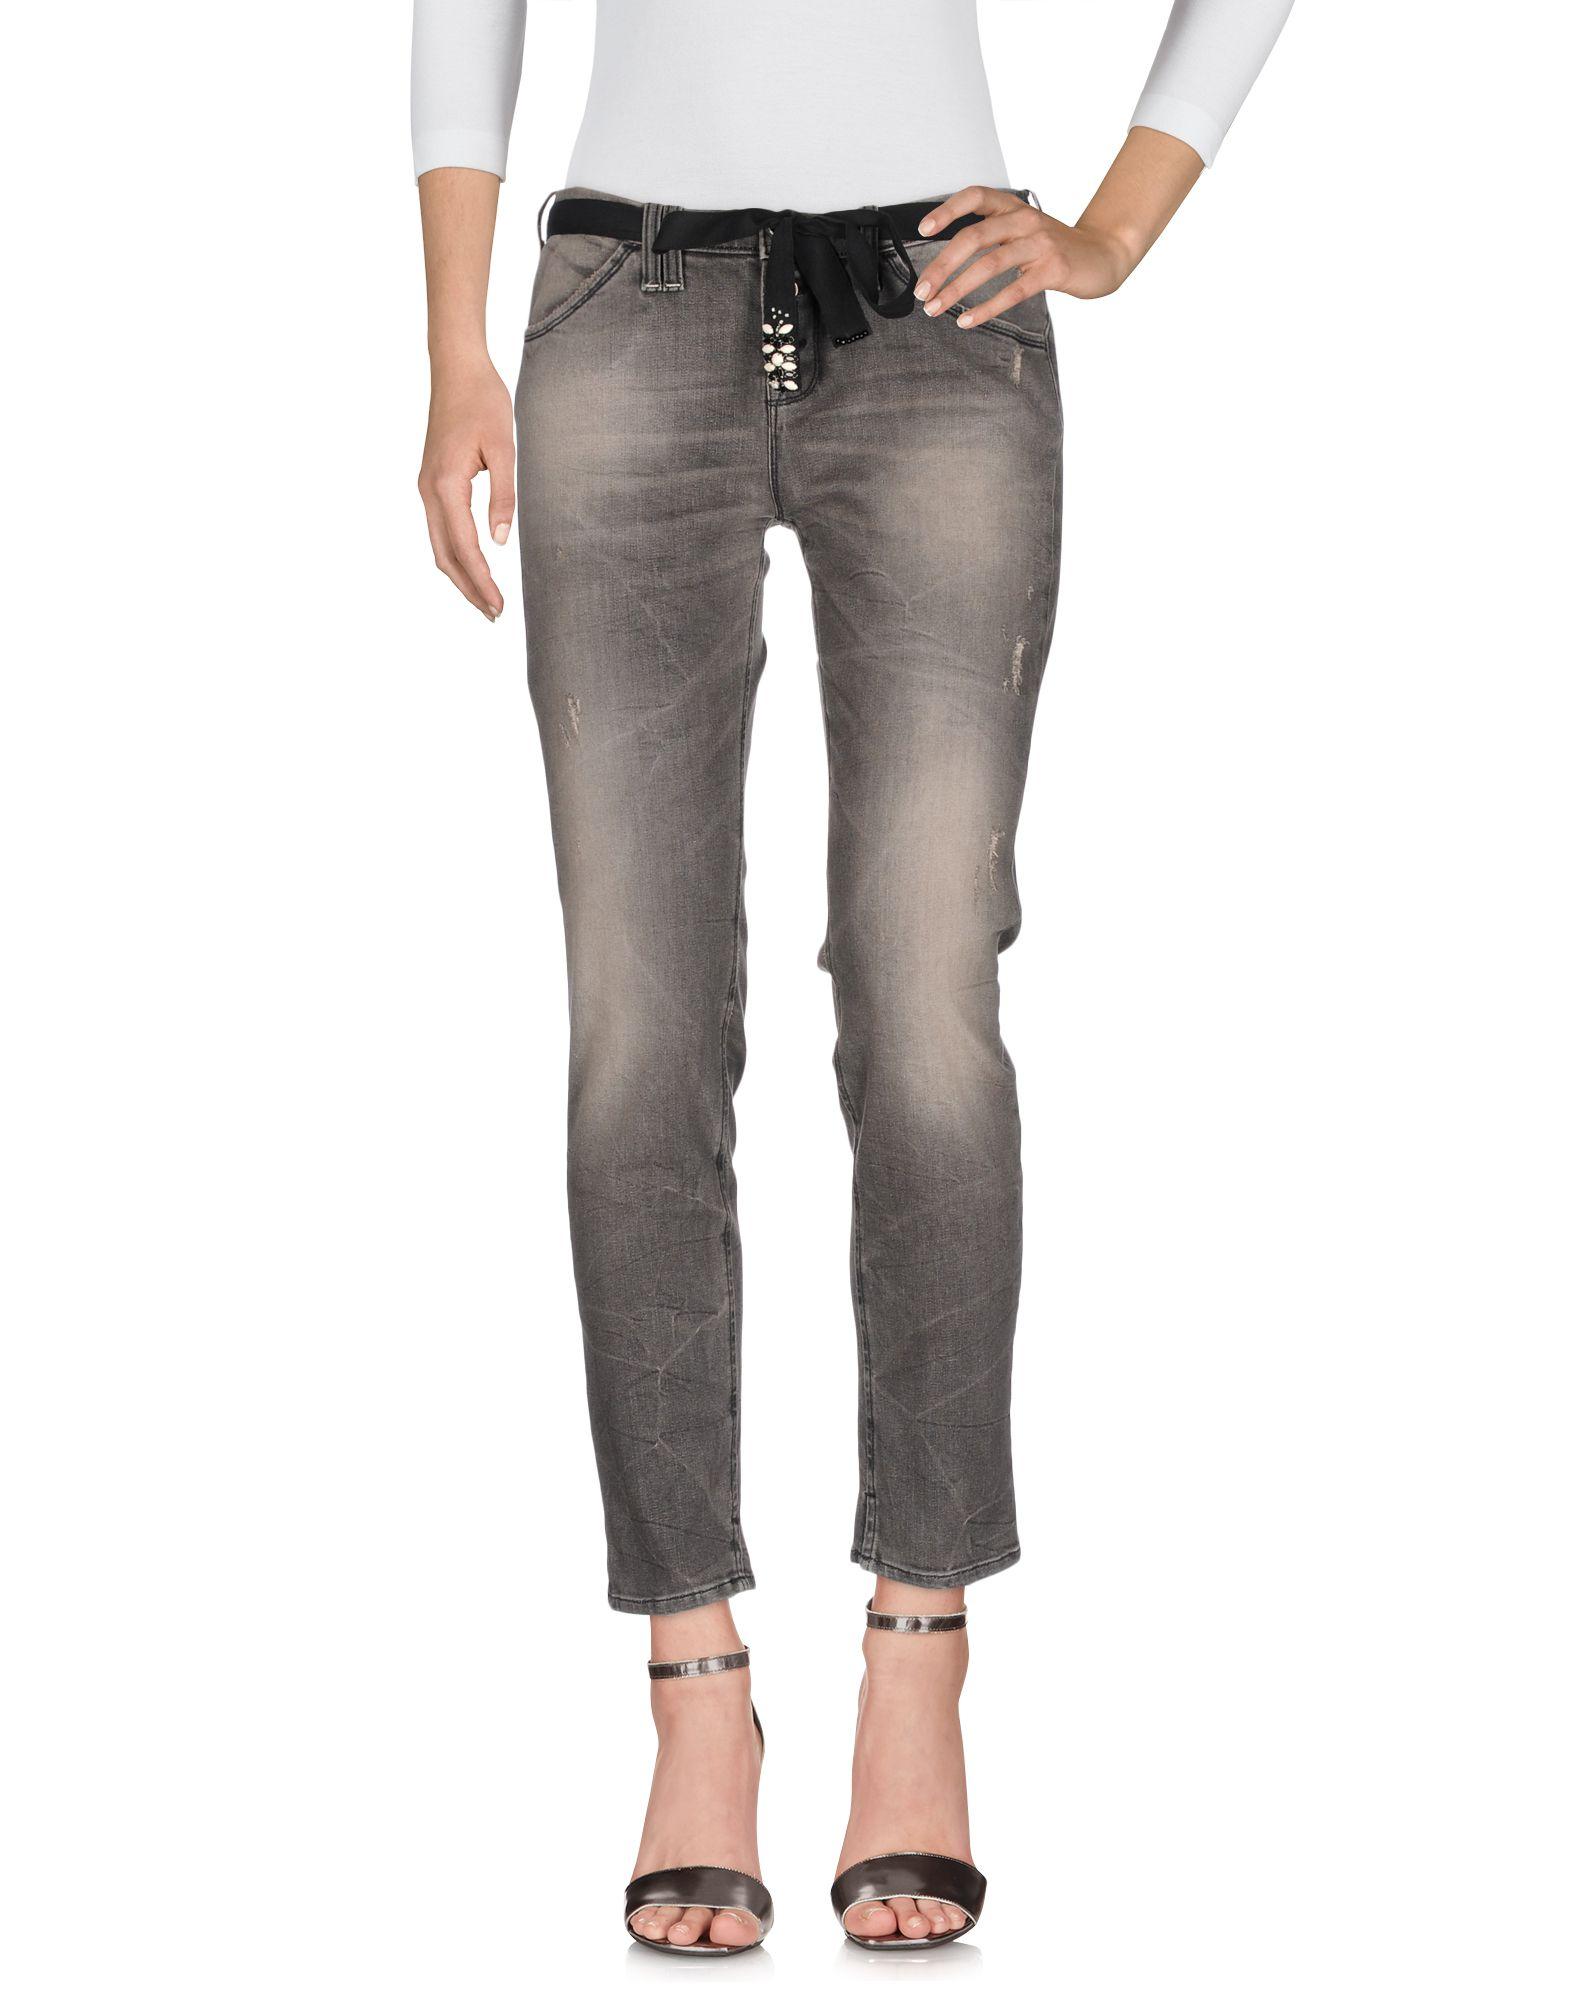 Pantaloni Jeans Twin-Set Jeans Donna - Acquista online su 33ZjsyL8b